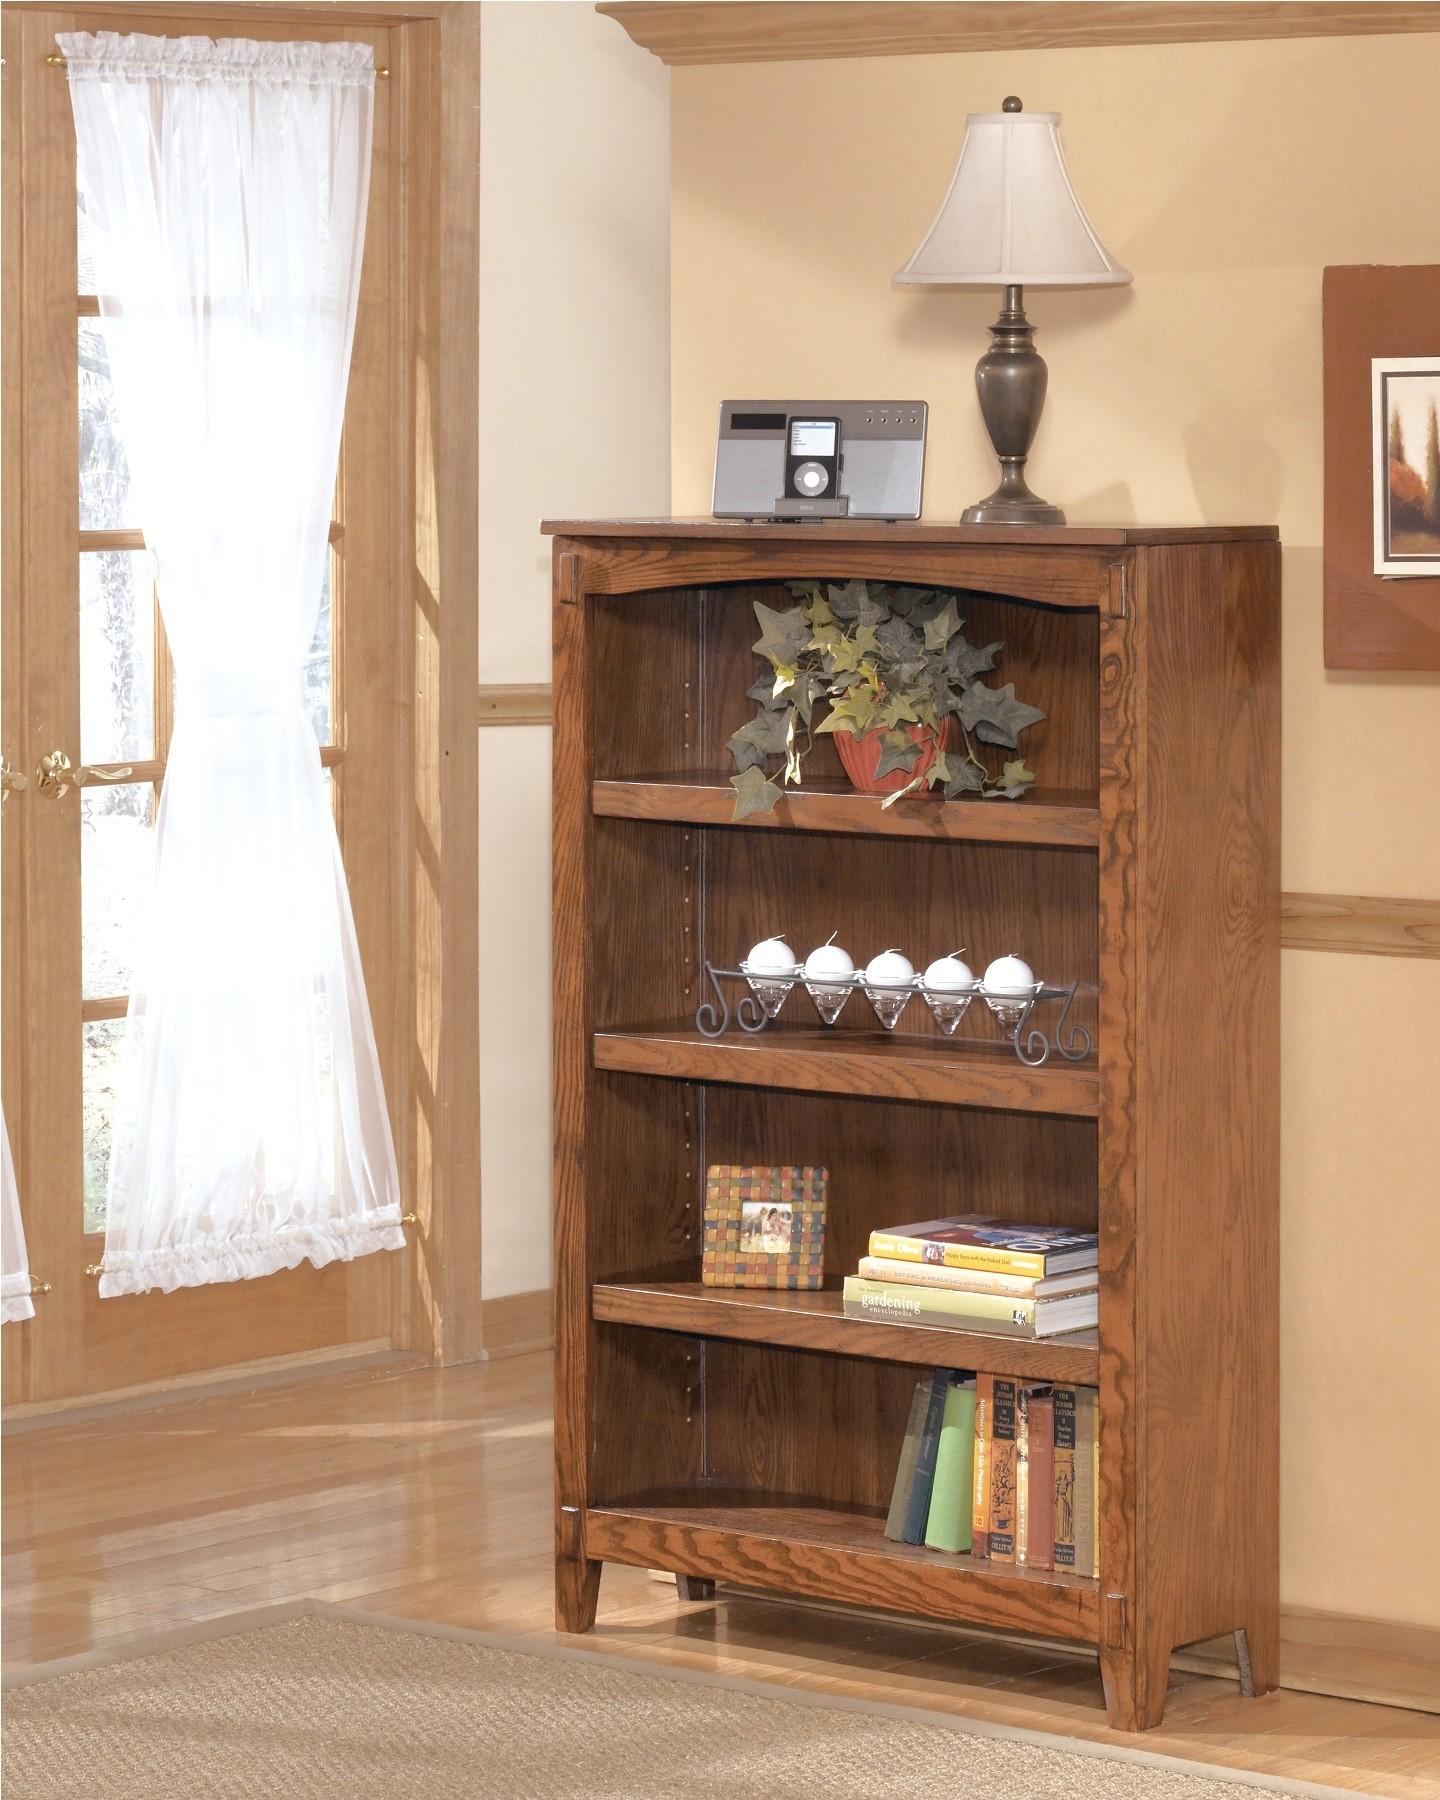 Cross Island Medium Bookcase From Ashley (H319-16